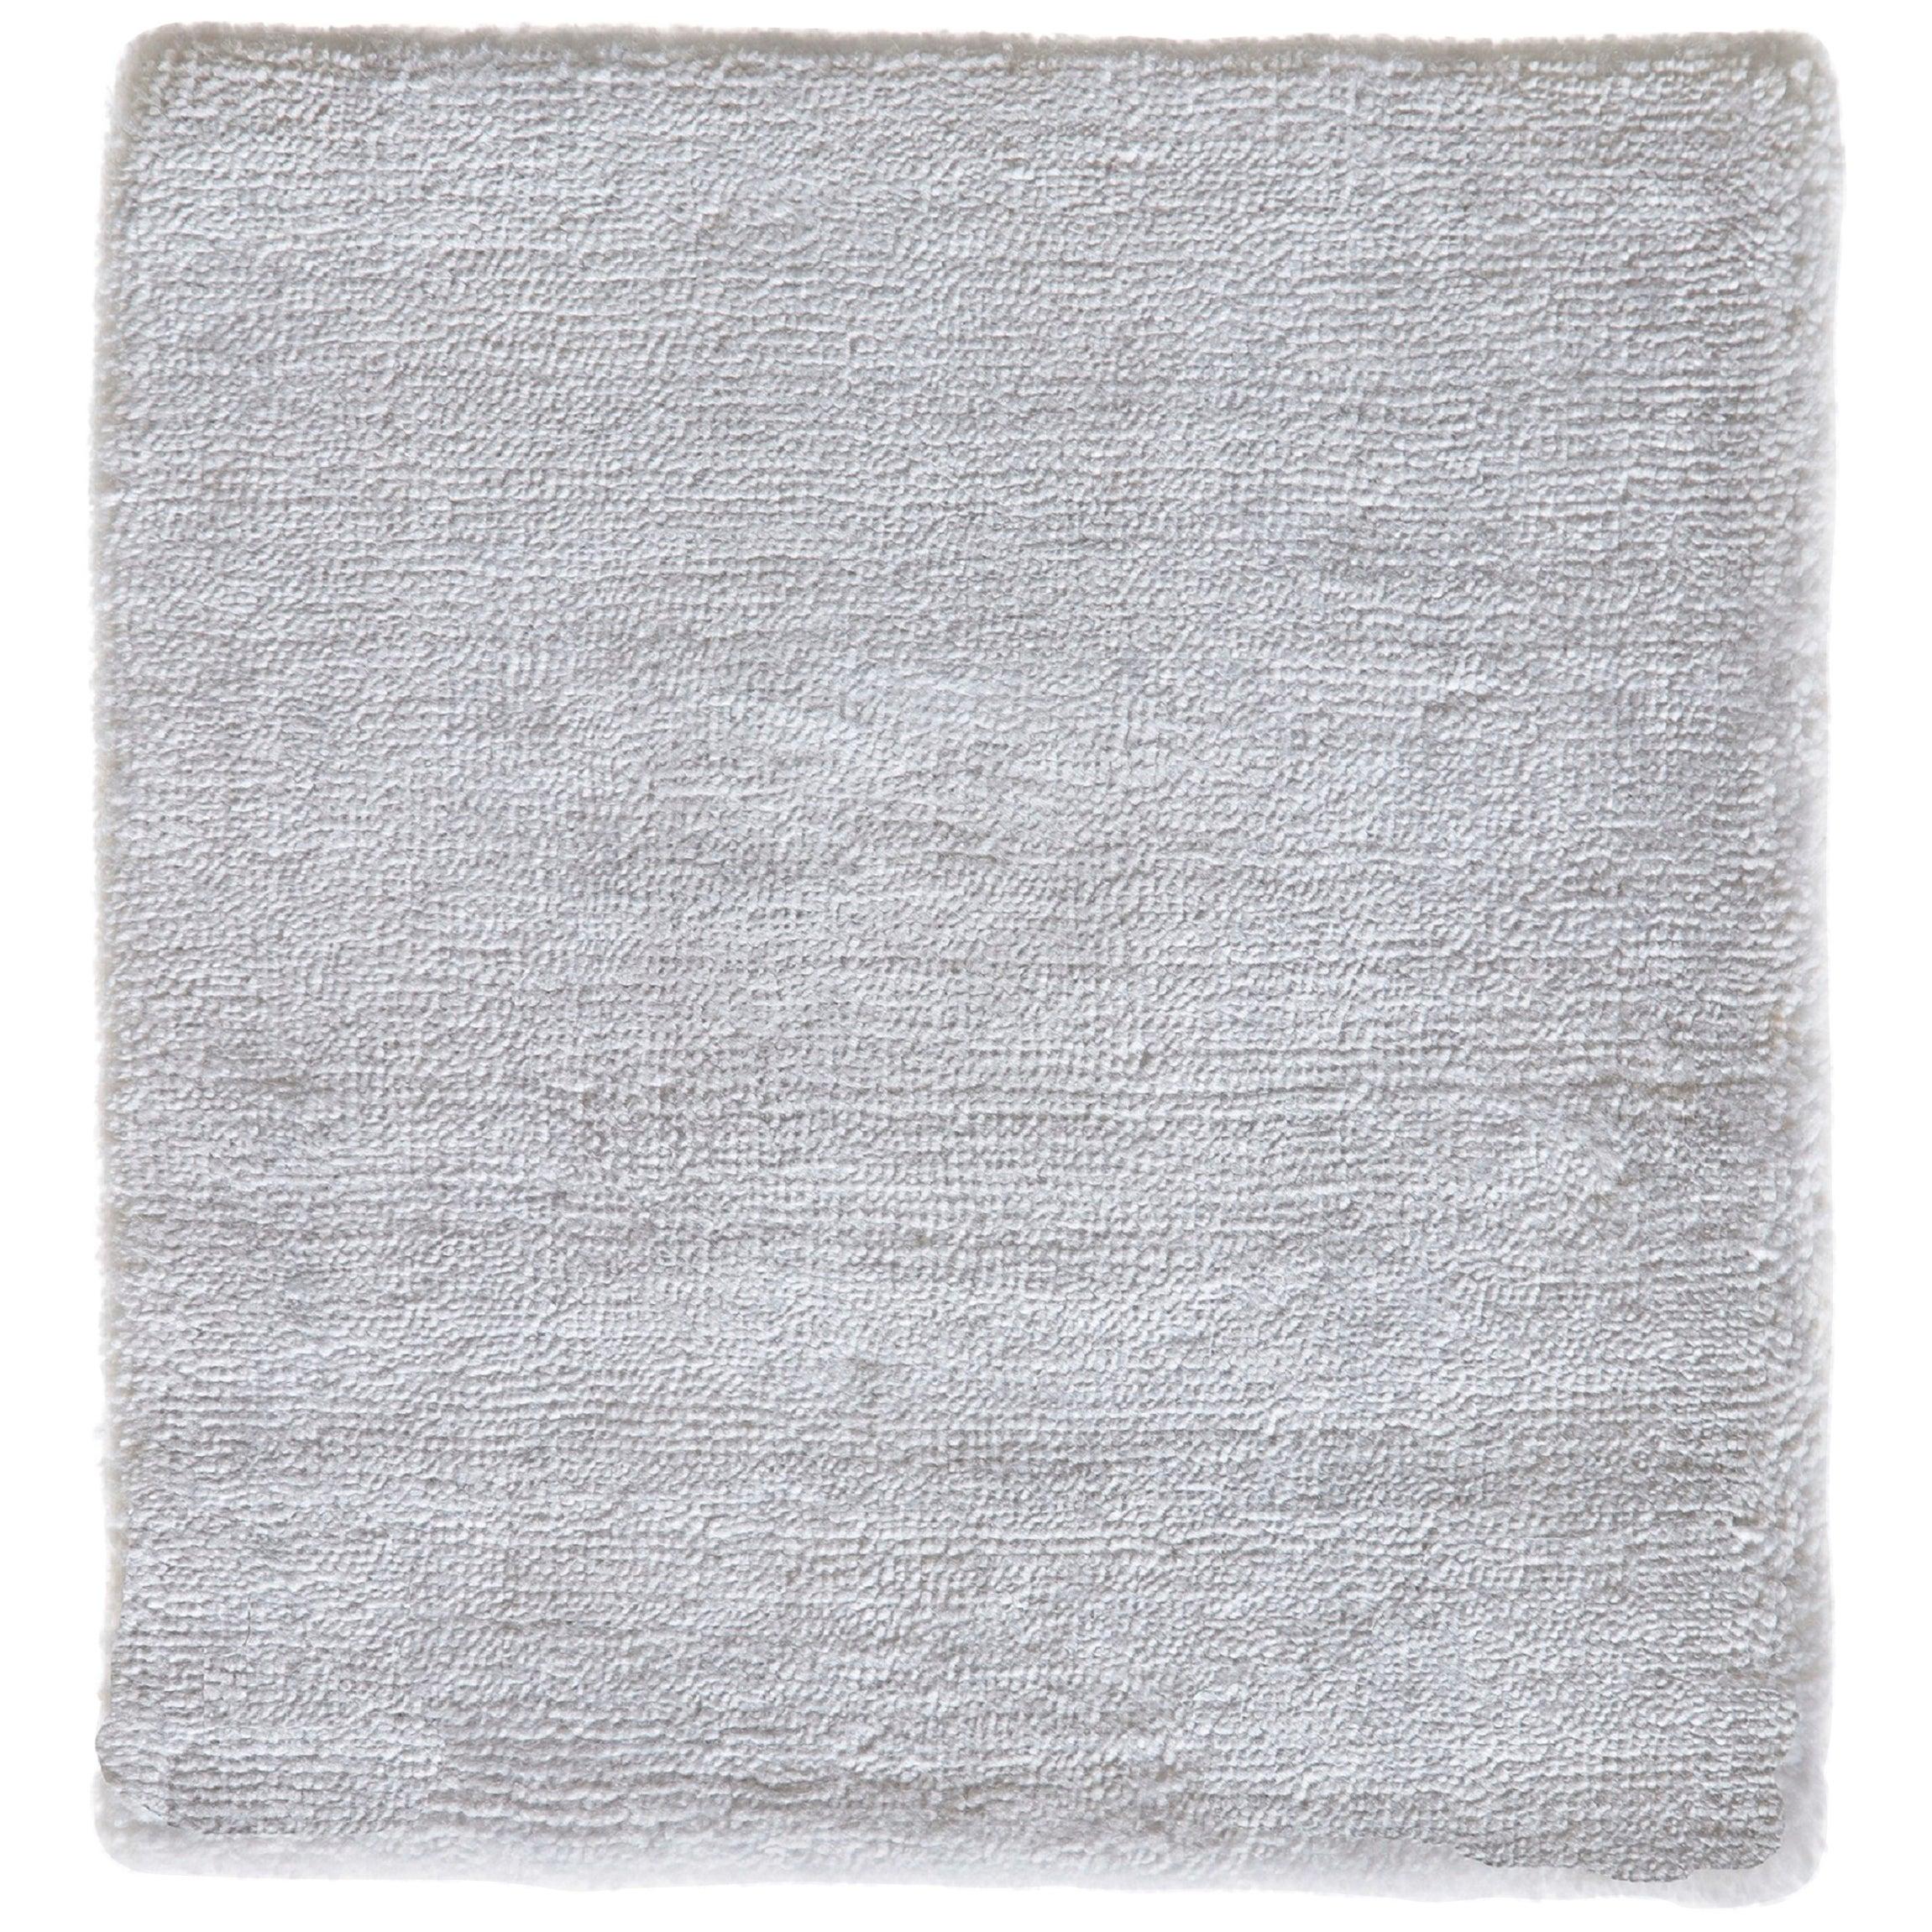 White Hand Woven Luxe Texture Soft Shine Smooth Finish Bamboo Silk Handmade Rug